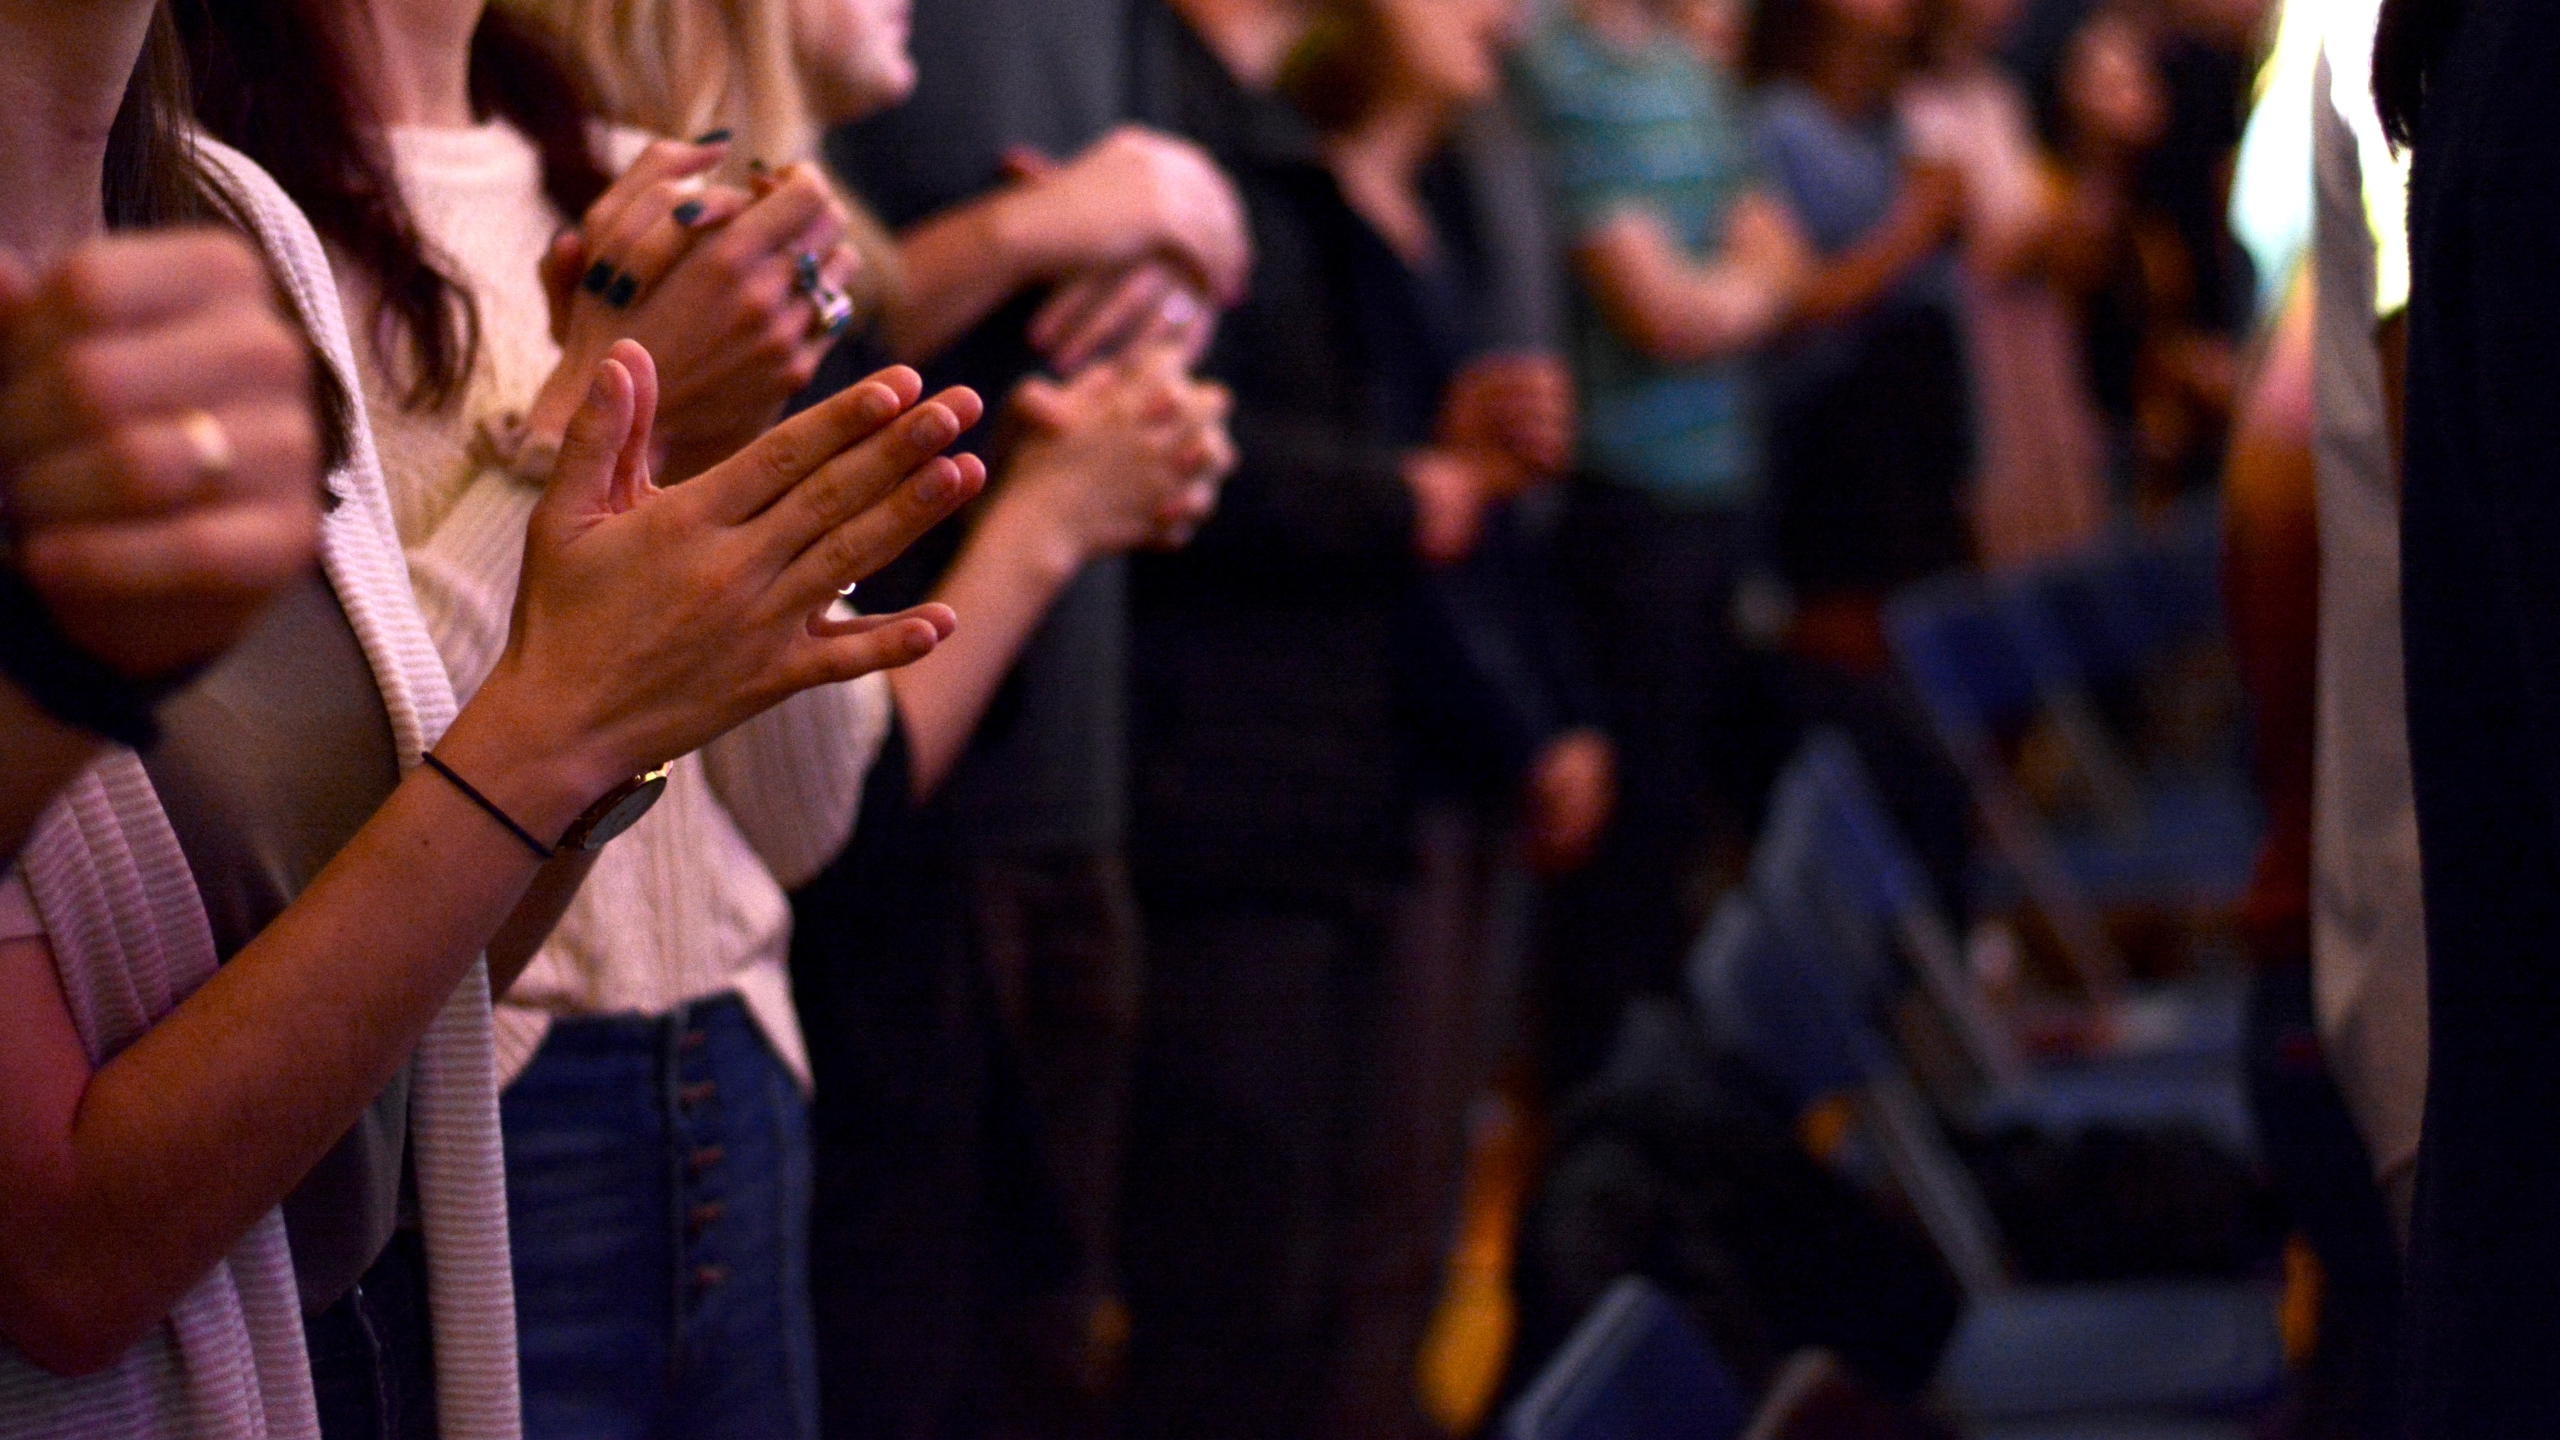 praying and worship and church